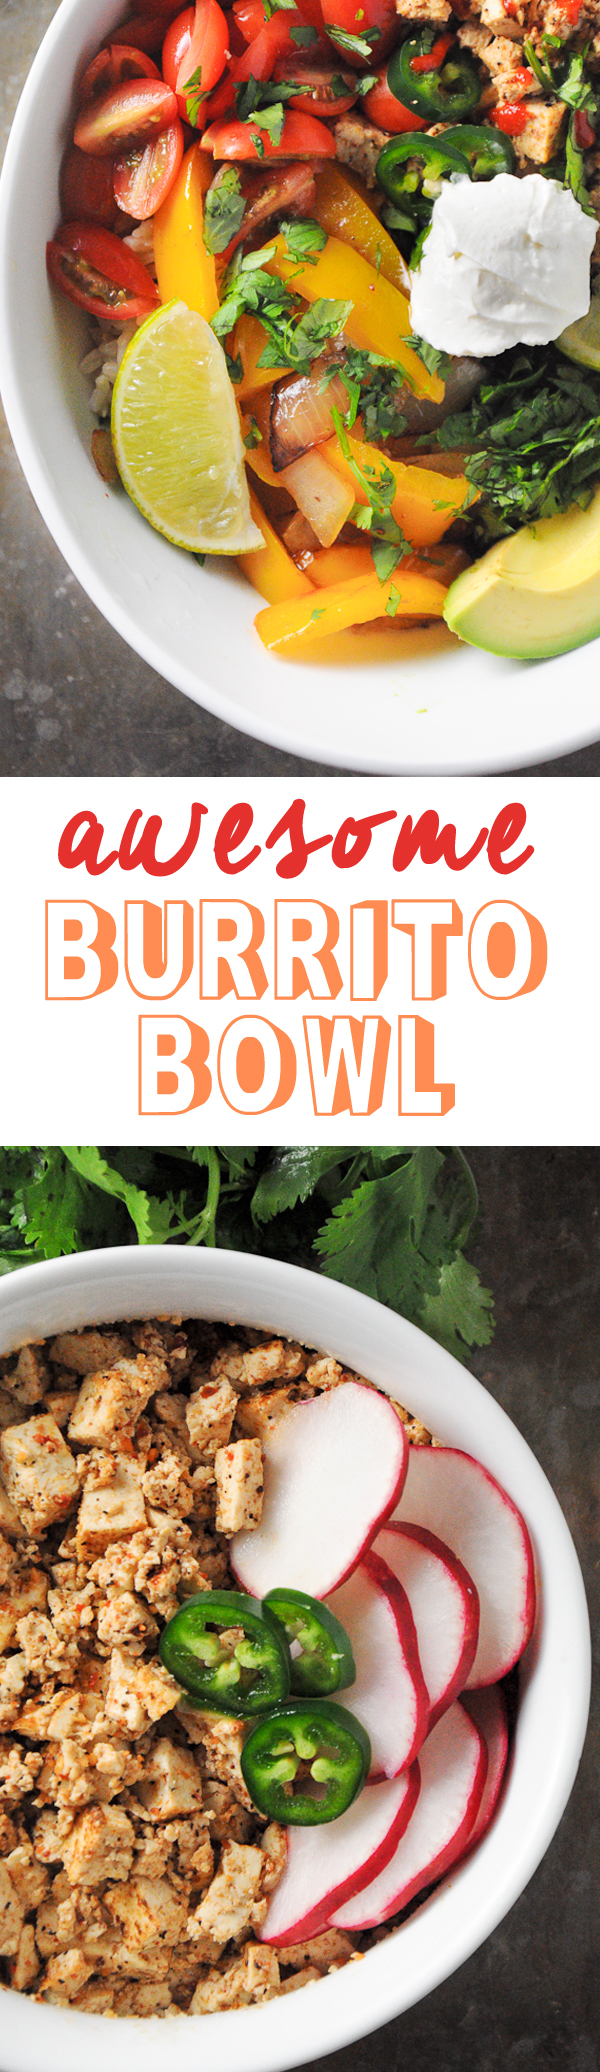 Burrito_Bowl.jpg